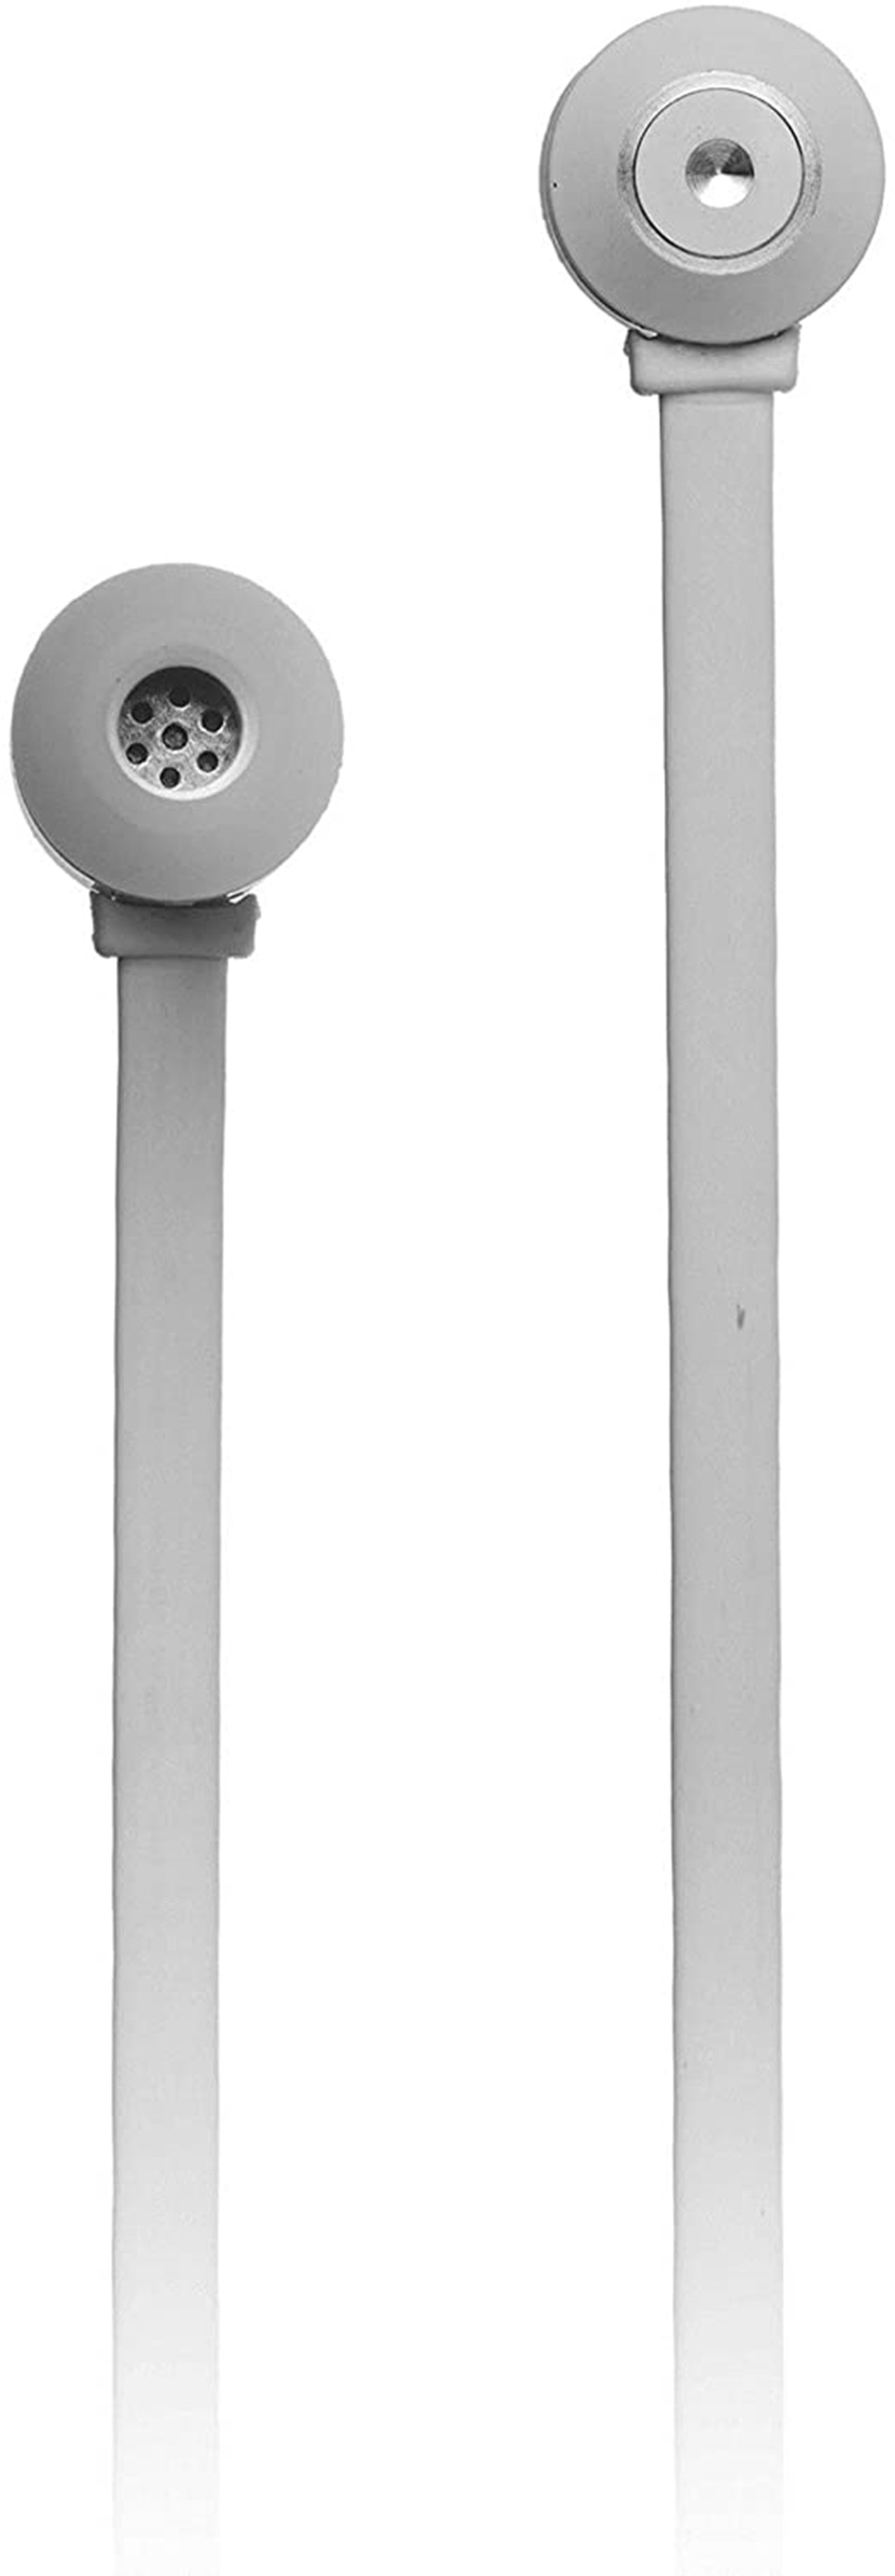 KitSound Ribbons Silver Bluetooth Earphones - 2